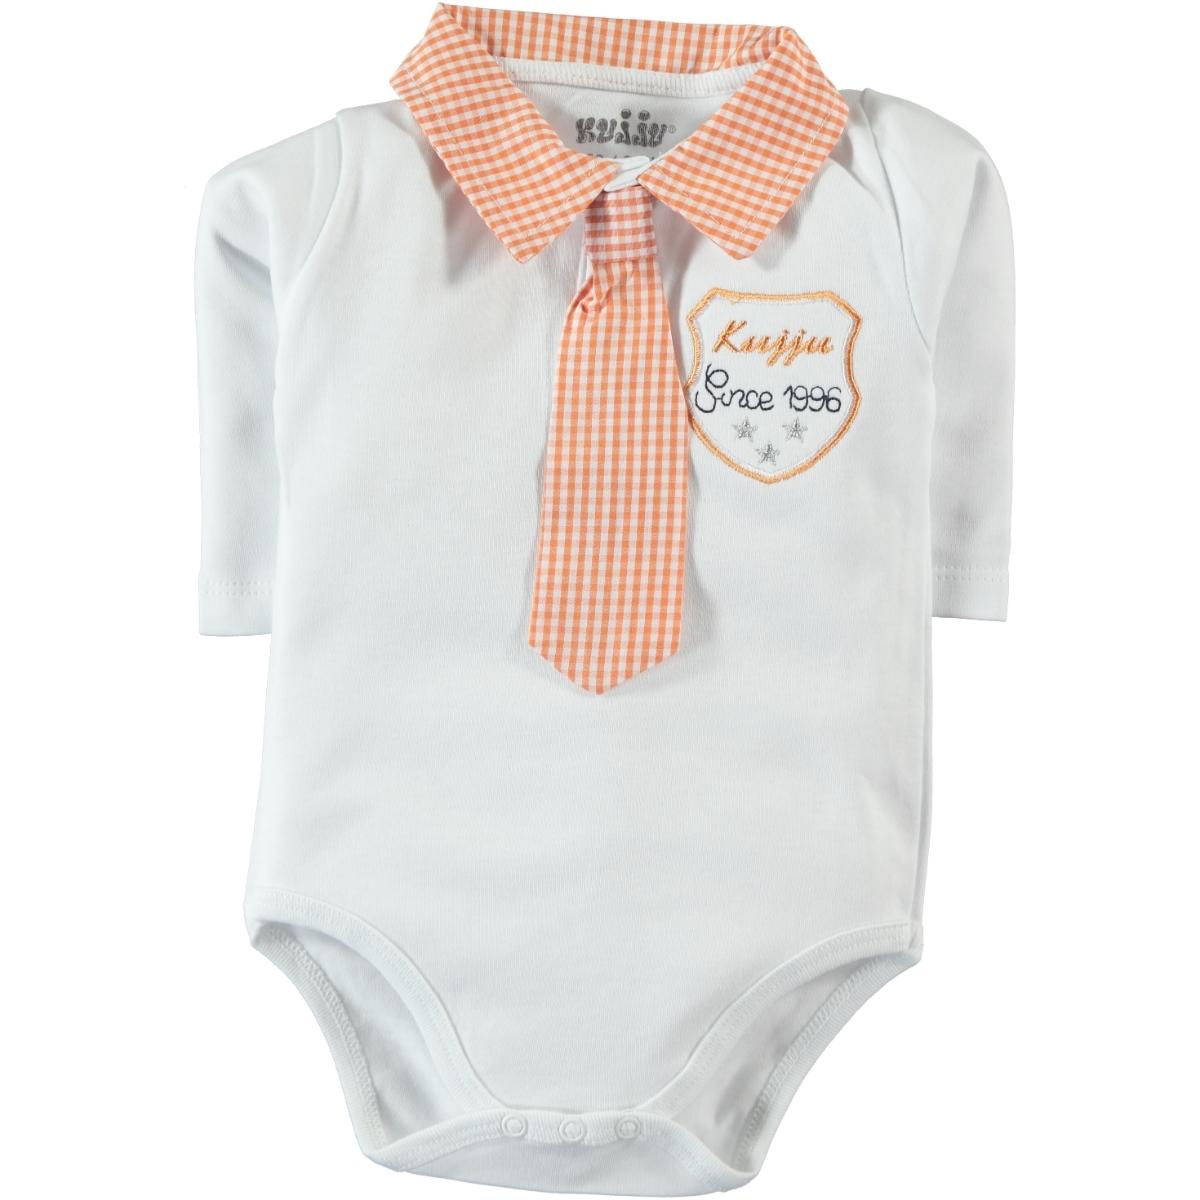 Kujju 3-9 Months Baby Boy Bodysuit With Snaps Orange